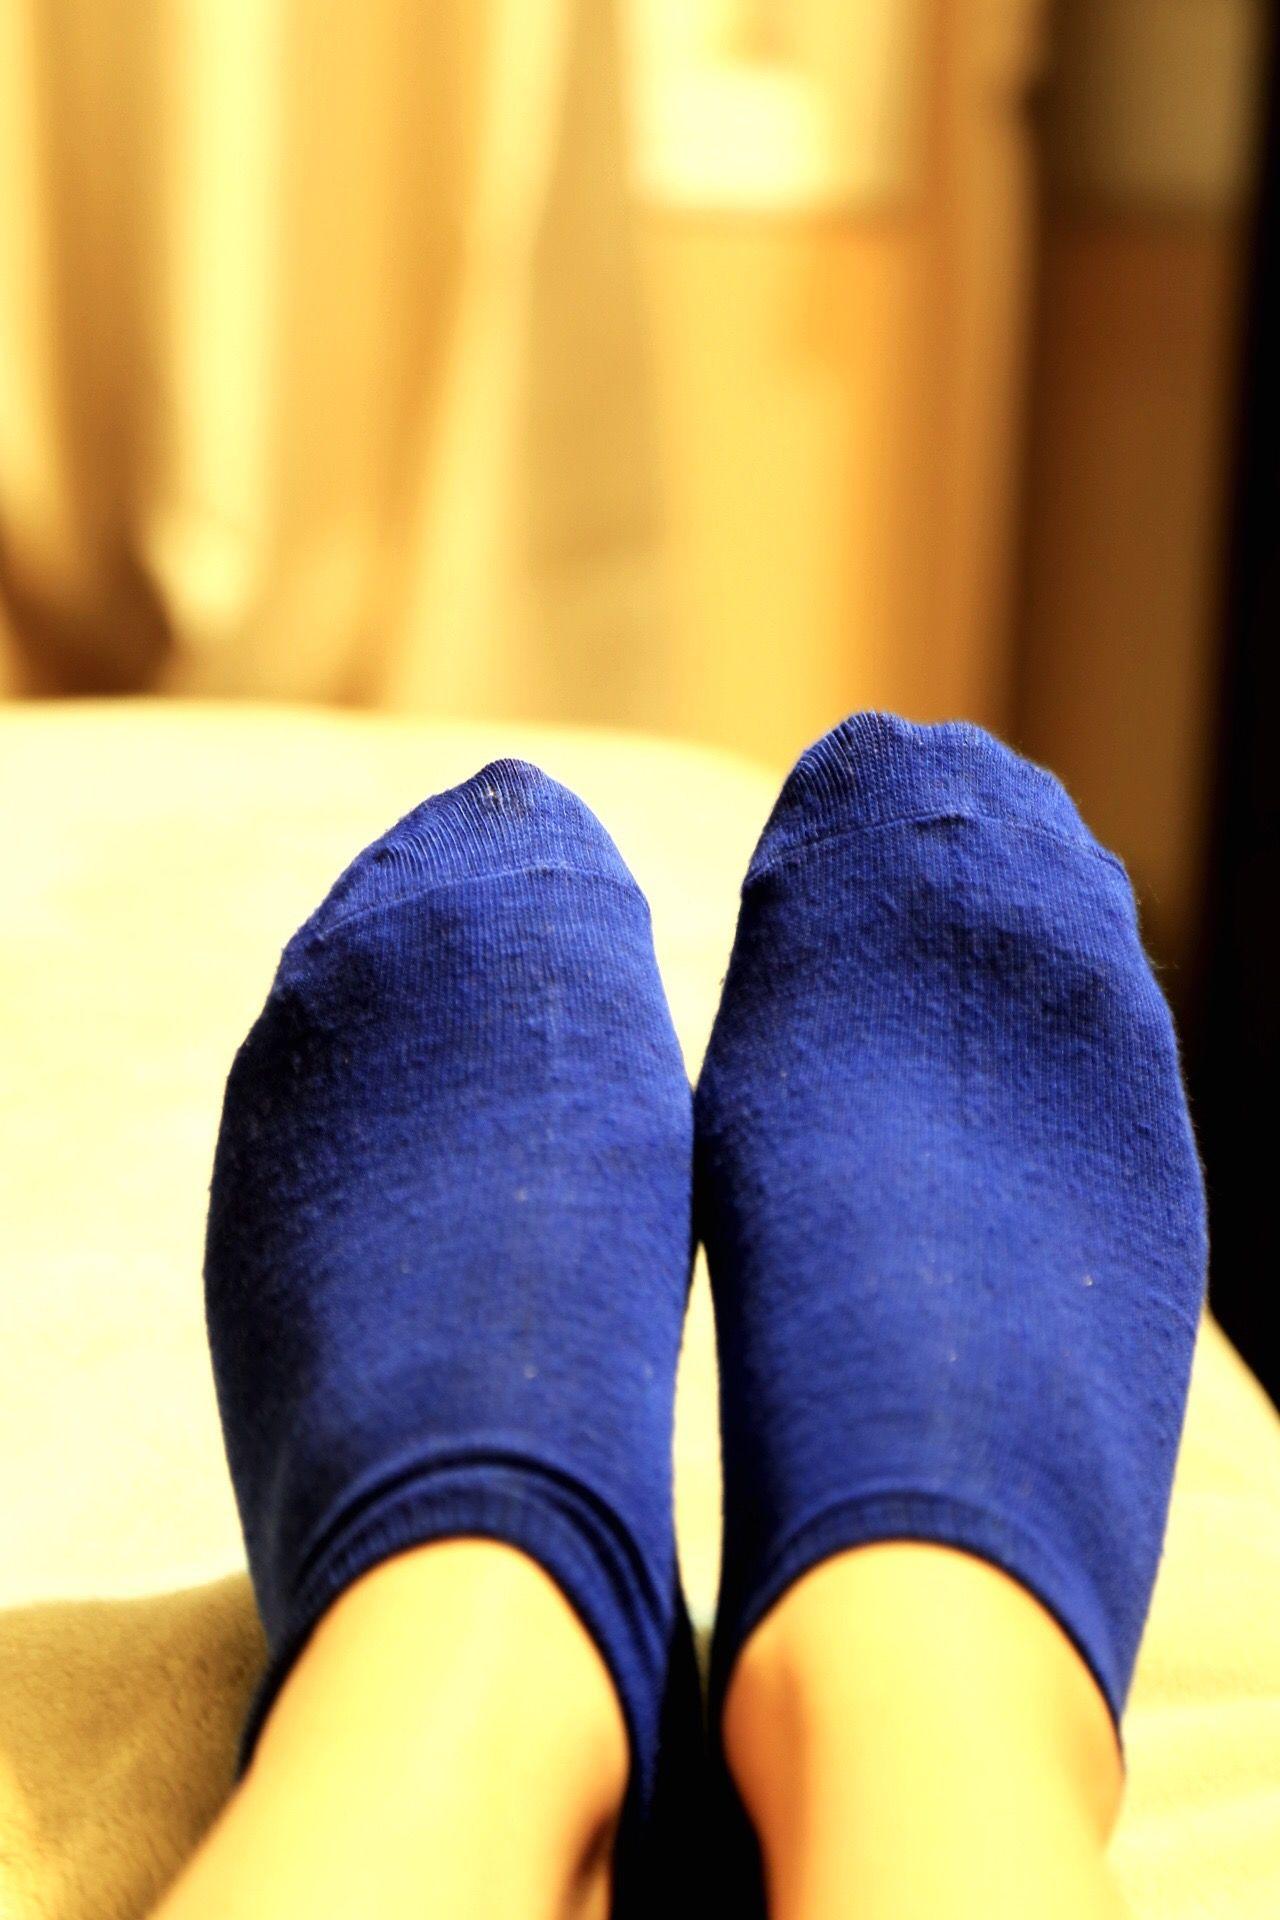 Relaxing! Socks Relaxing Relaxing Moments Bluesocks Bluefeet Blue Feelingblue Comfortable